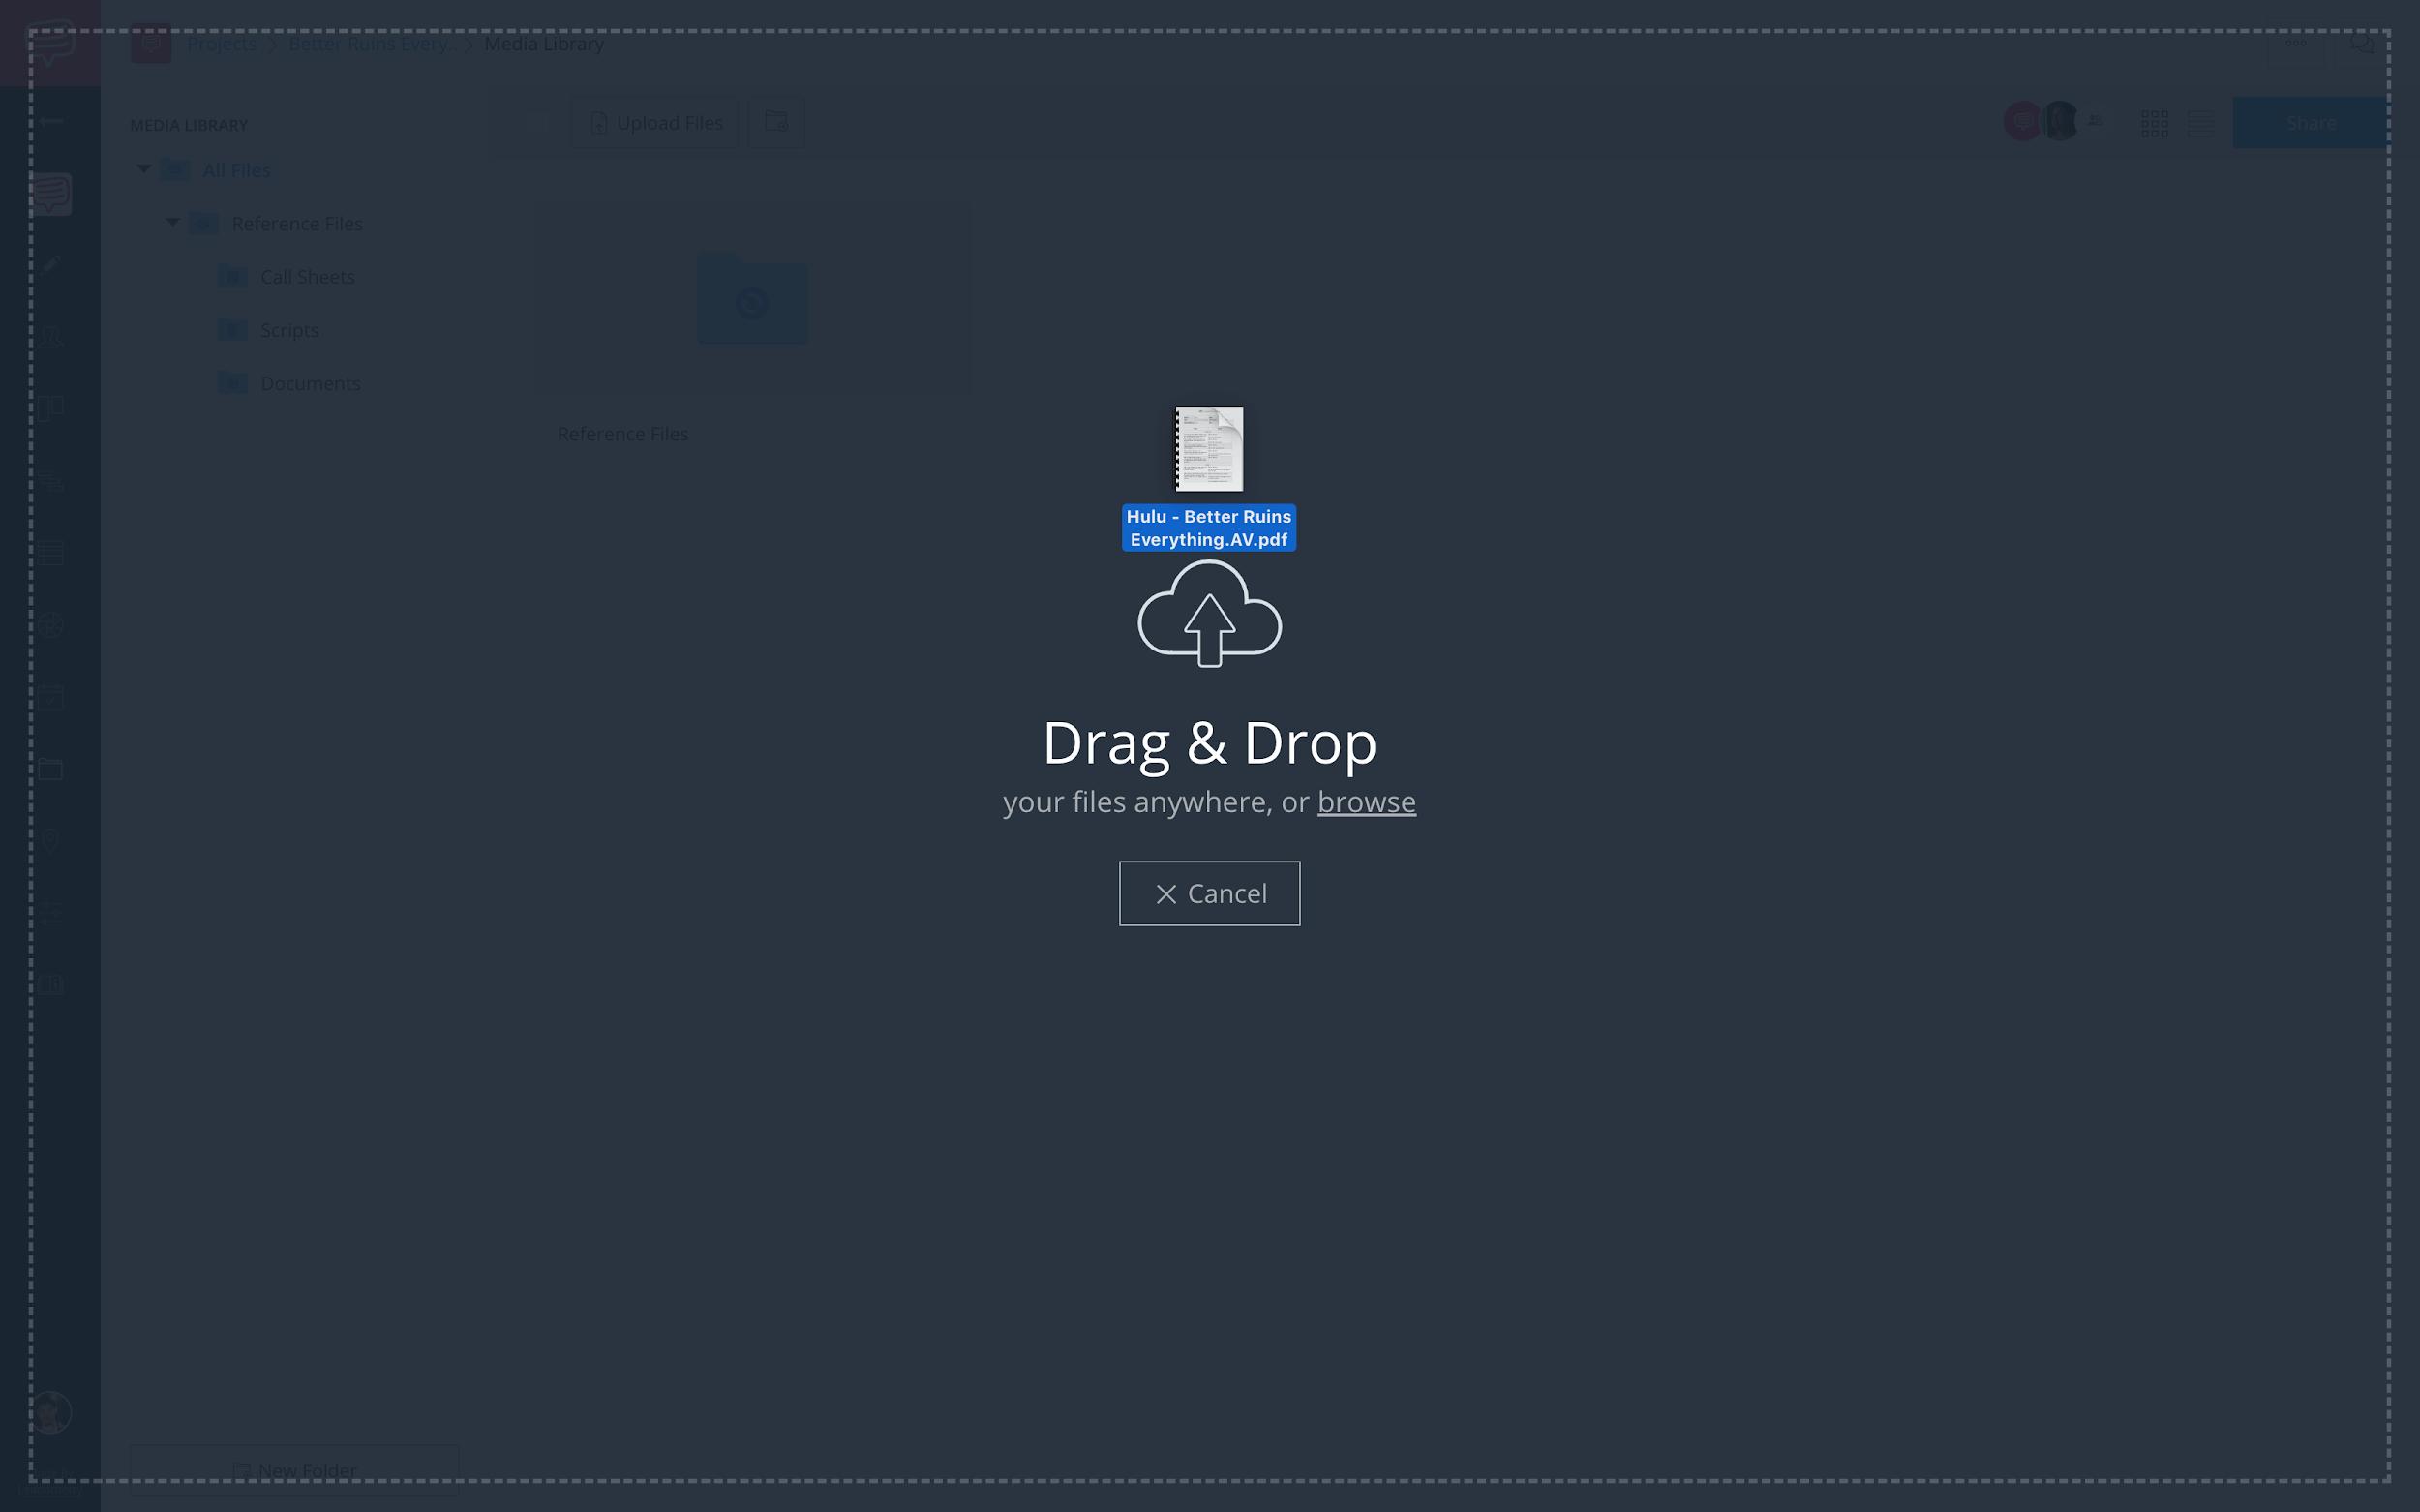 Upload files pop-up - Drag and drop file